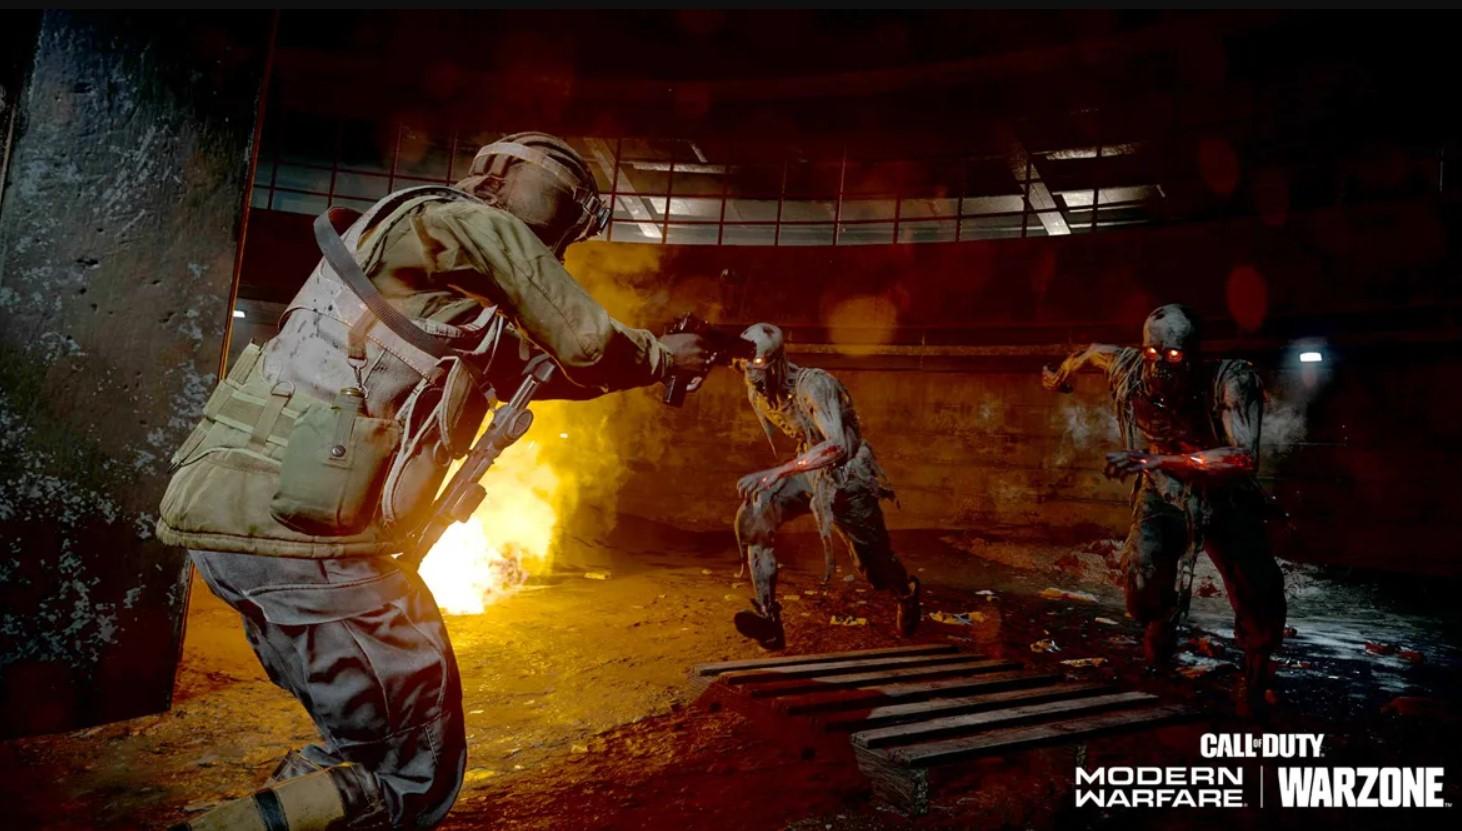 Halloween llega a Call of Duty: Modern Warfare y Warzone: los detalles de Haunting of Verdansk